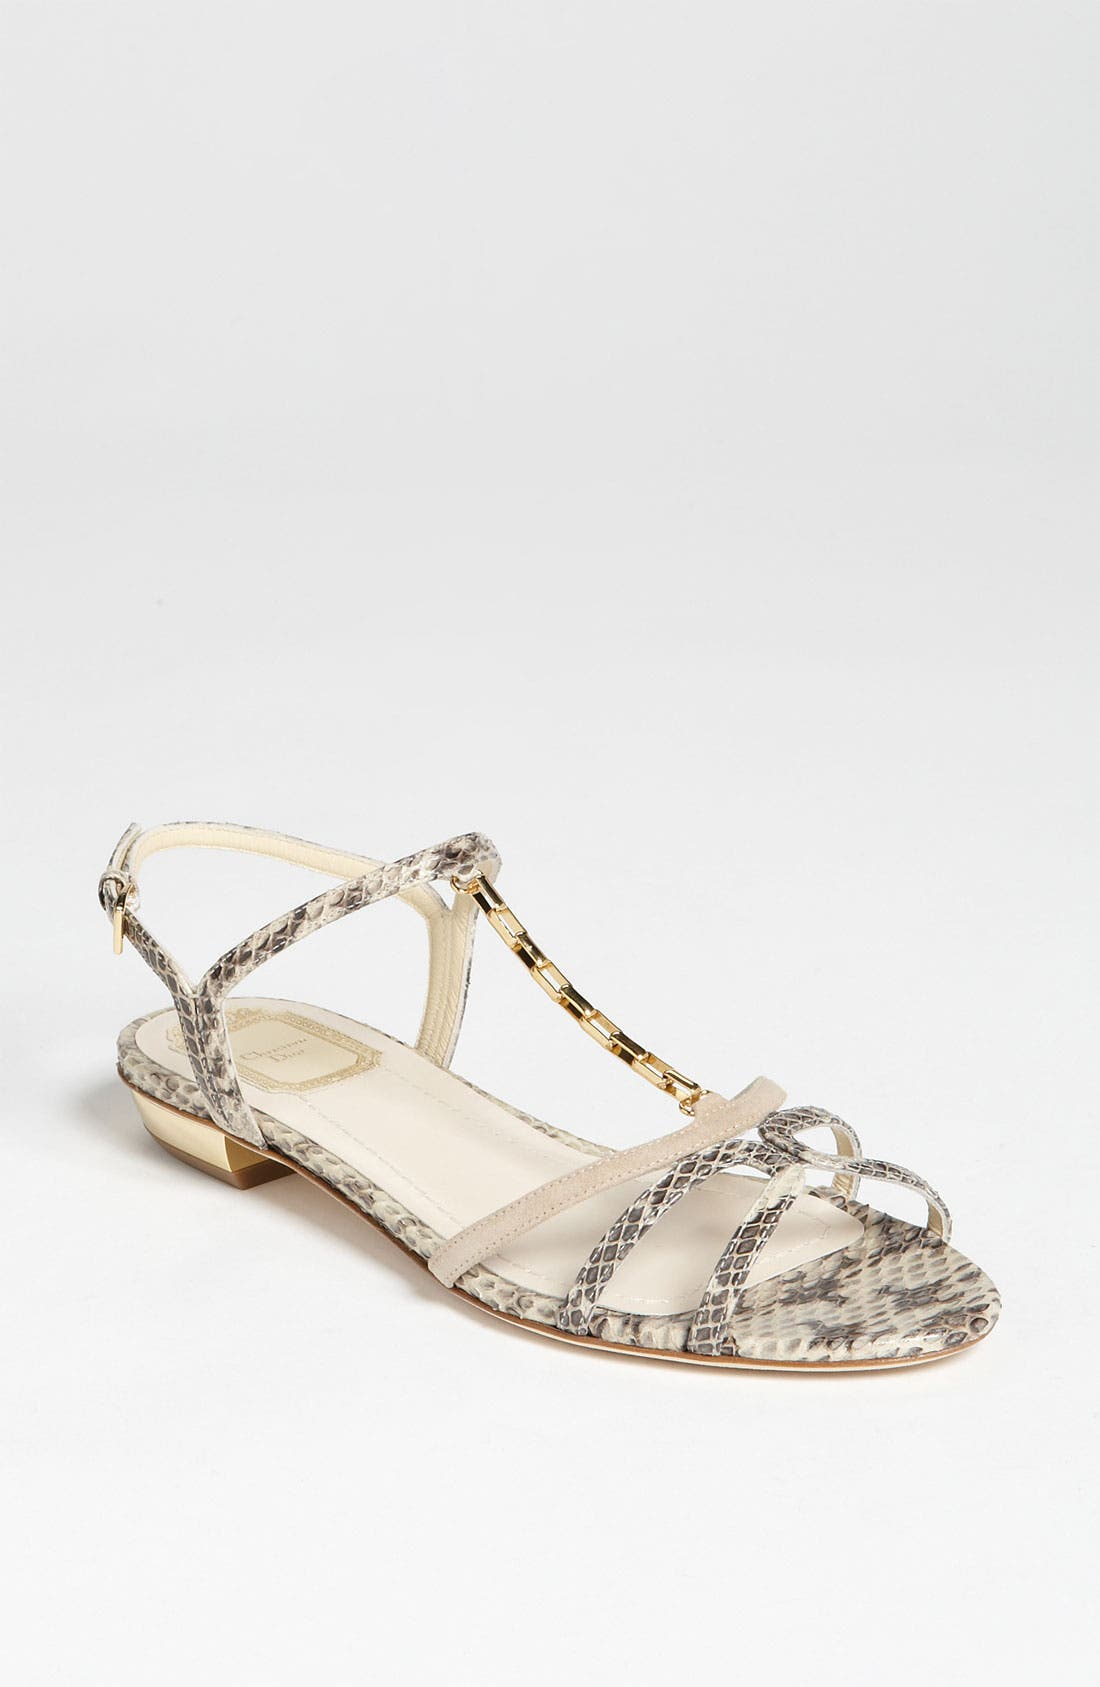 Dior 'Chain' Sandal   Nordstrom